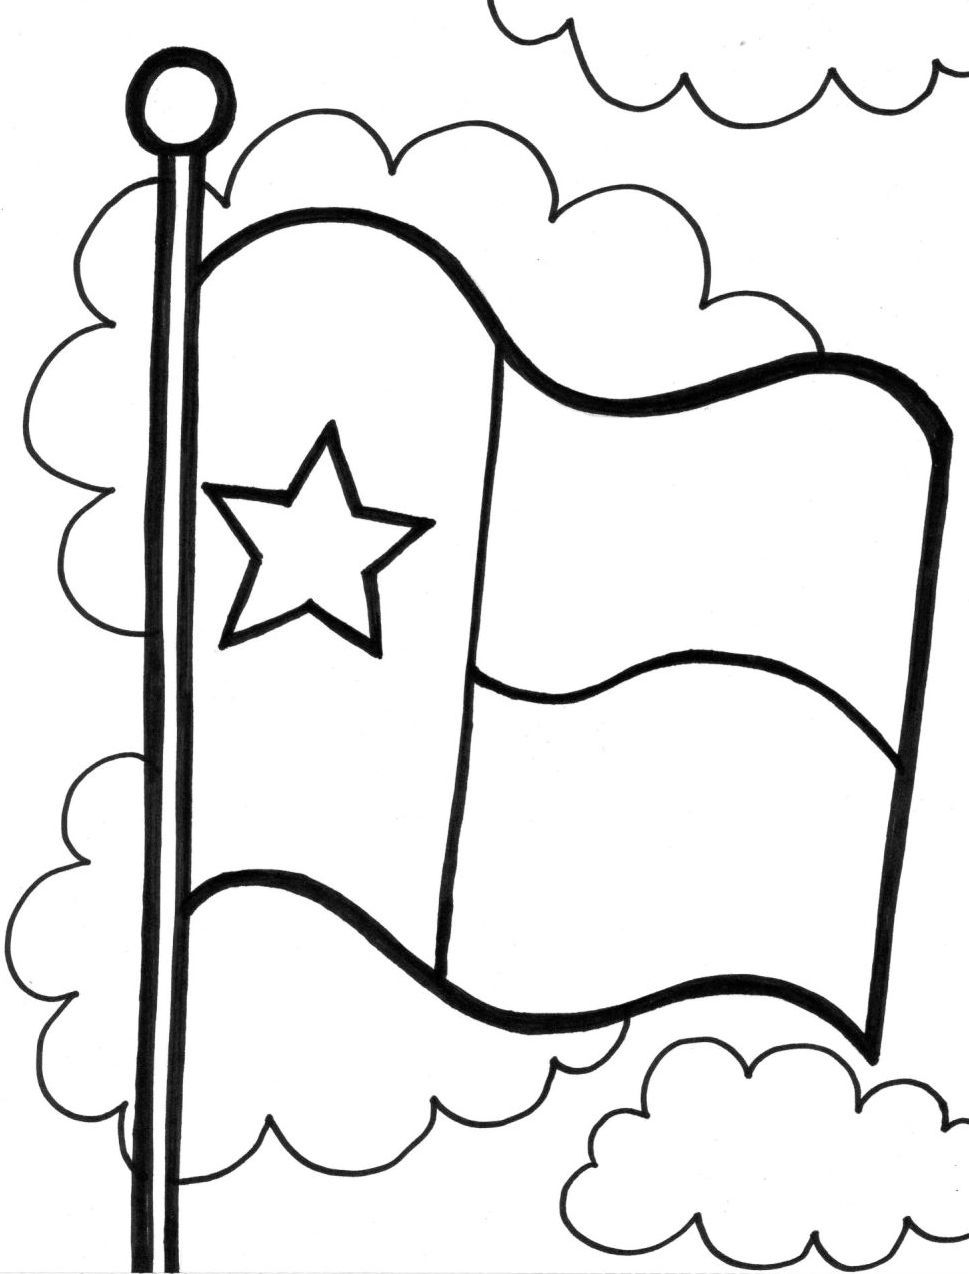 Texas Flag Coloring Page : texas, coloring, Texas-flag-coloring-page, Coloring, Pages,, Texas, Symbols